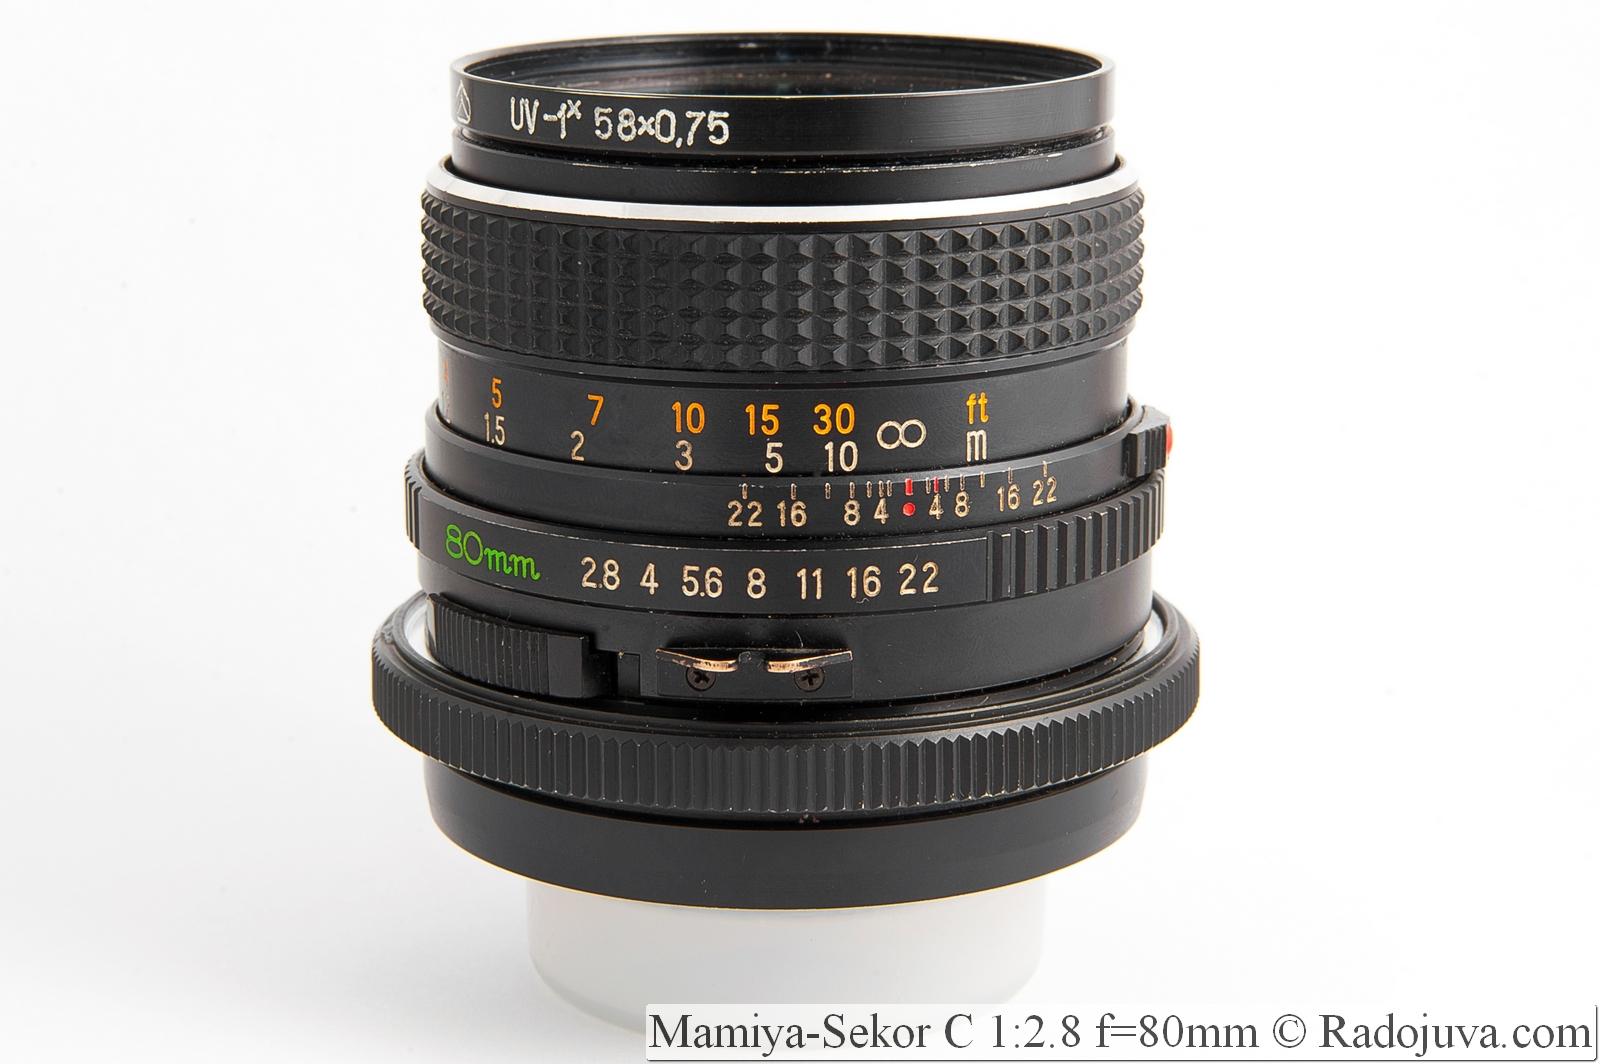 Mamiya-Sekor C 1:2.8 f=80mm